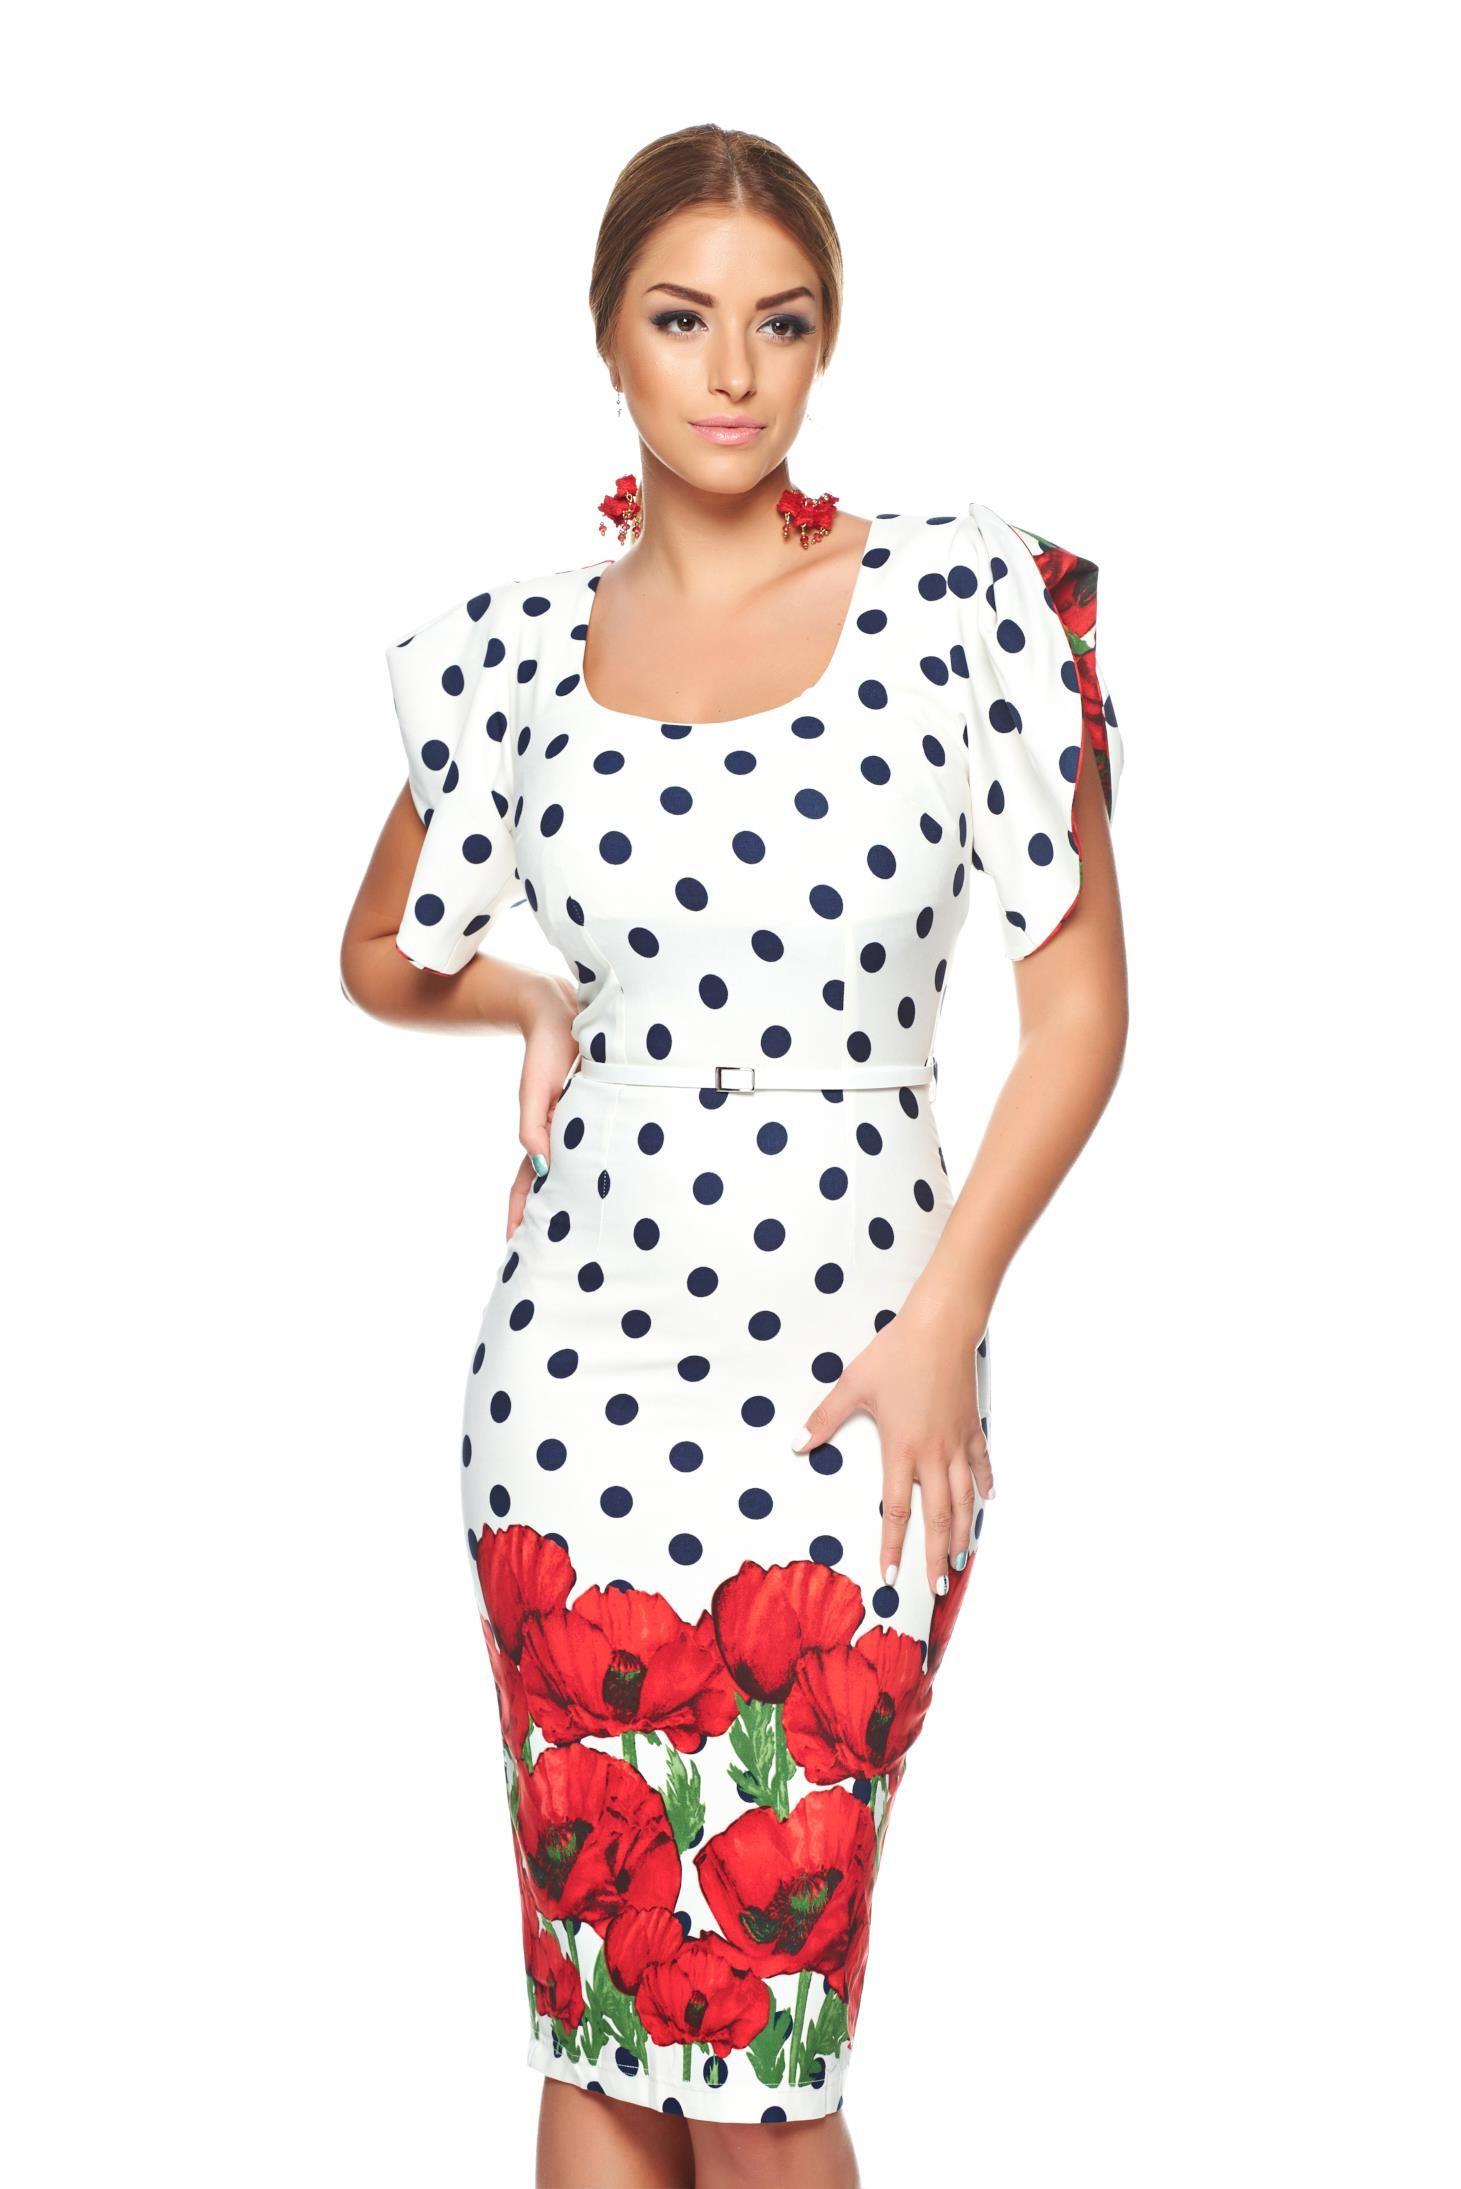 Prettygirl Trust Me White Dress Floral Prints Form Fitting